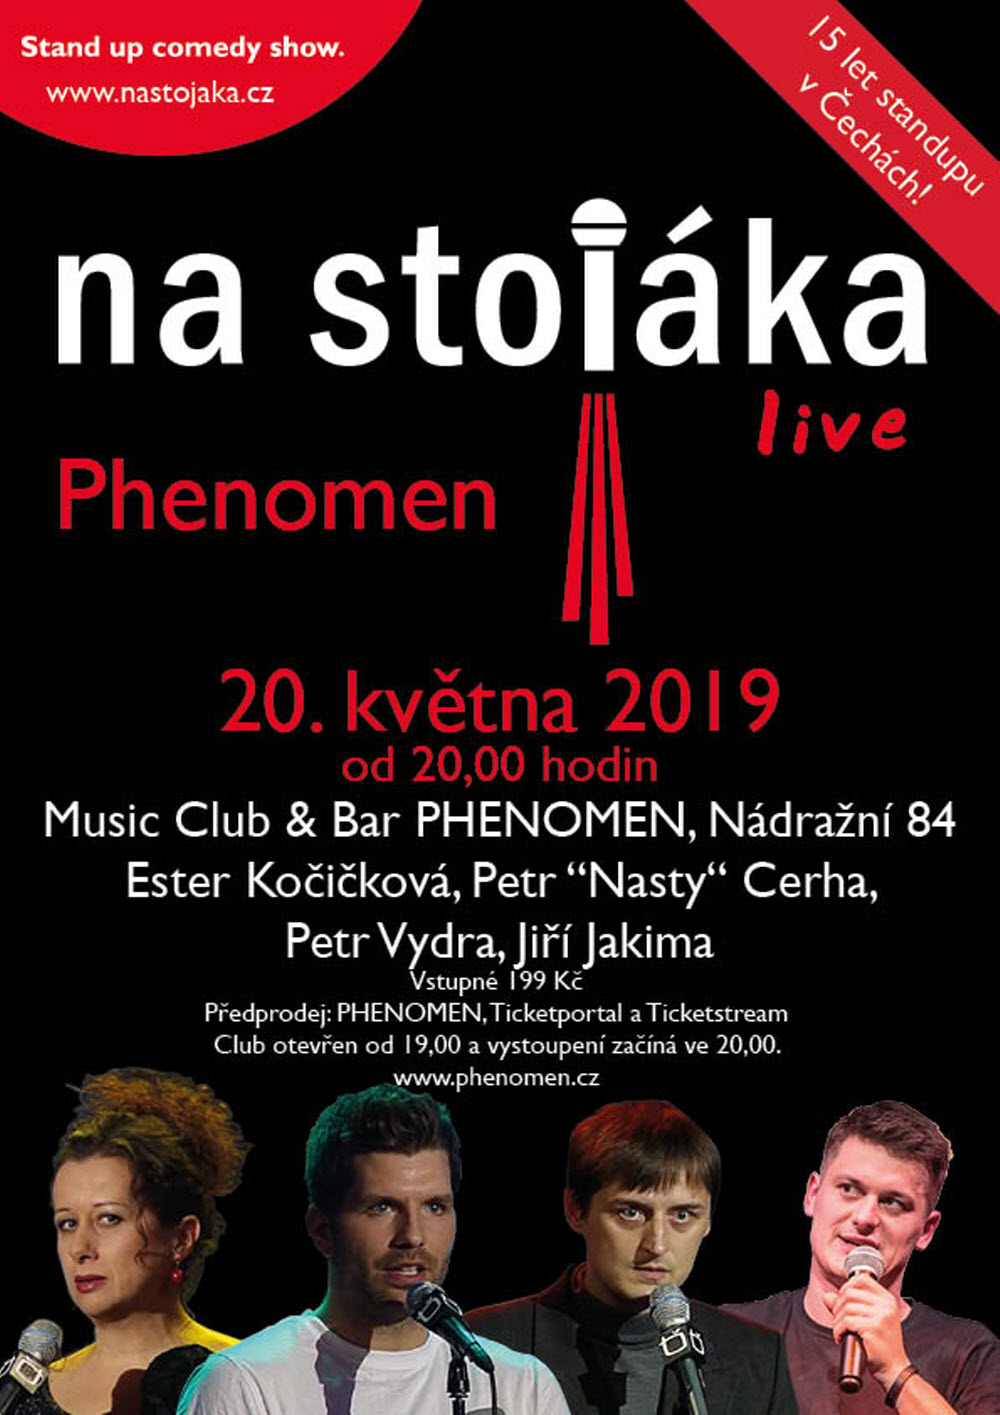 picture Na stojáka - live v Music Club & Bar PHENOMEN